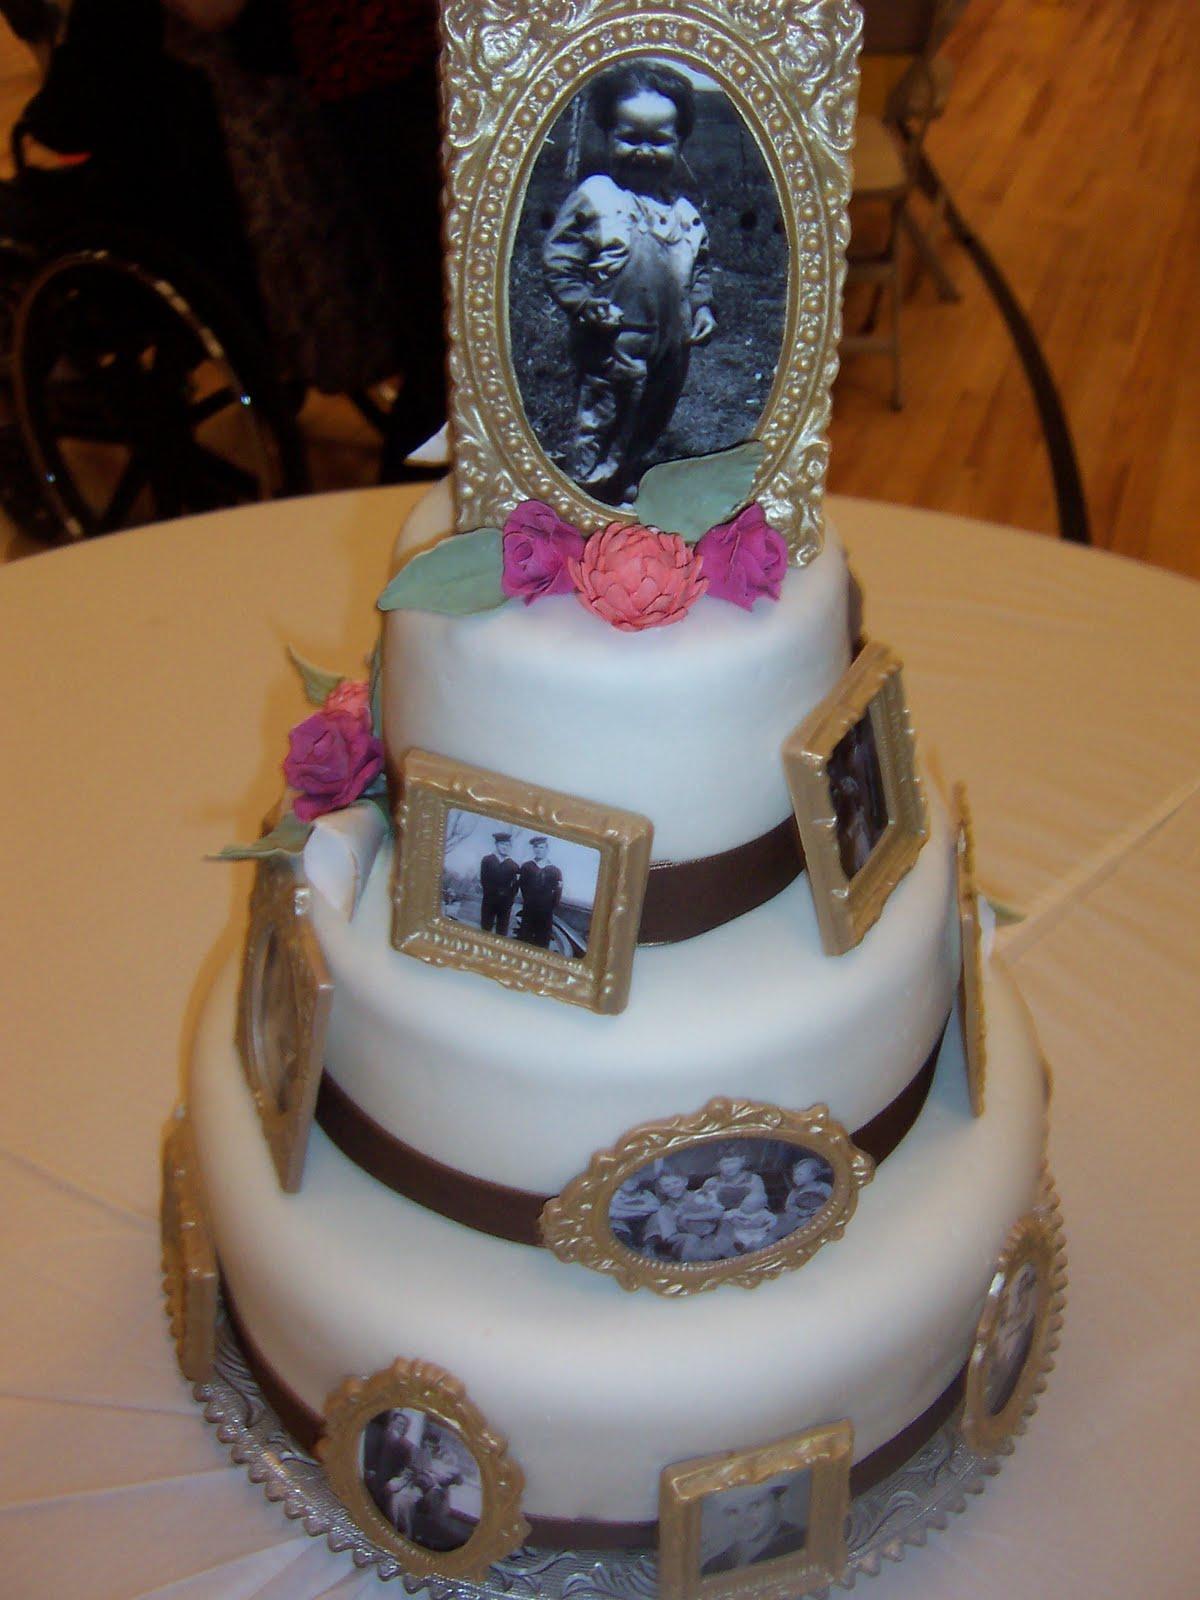 Grandpa Birthday Cake Recipes Image Inspiration of Cake and